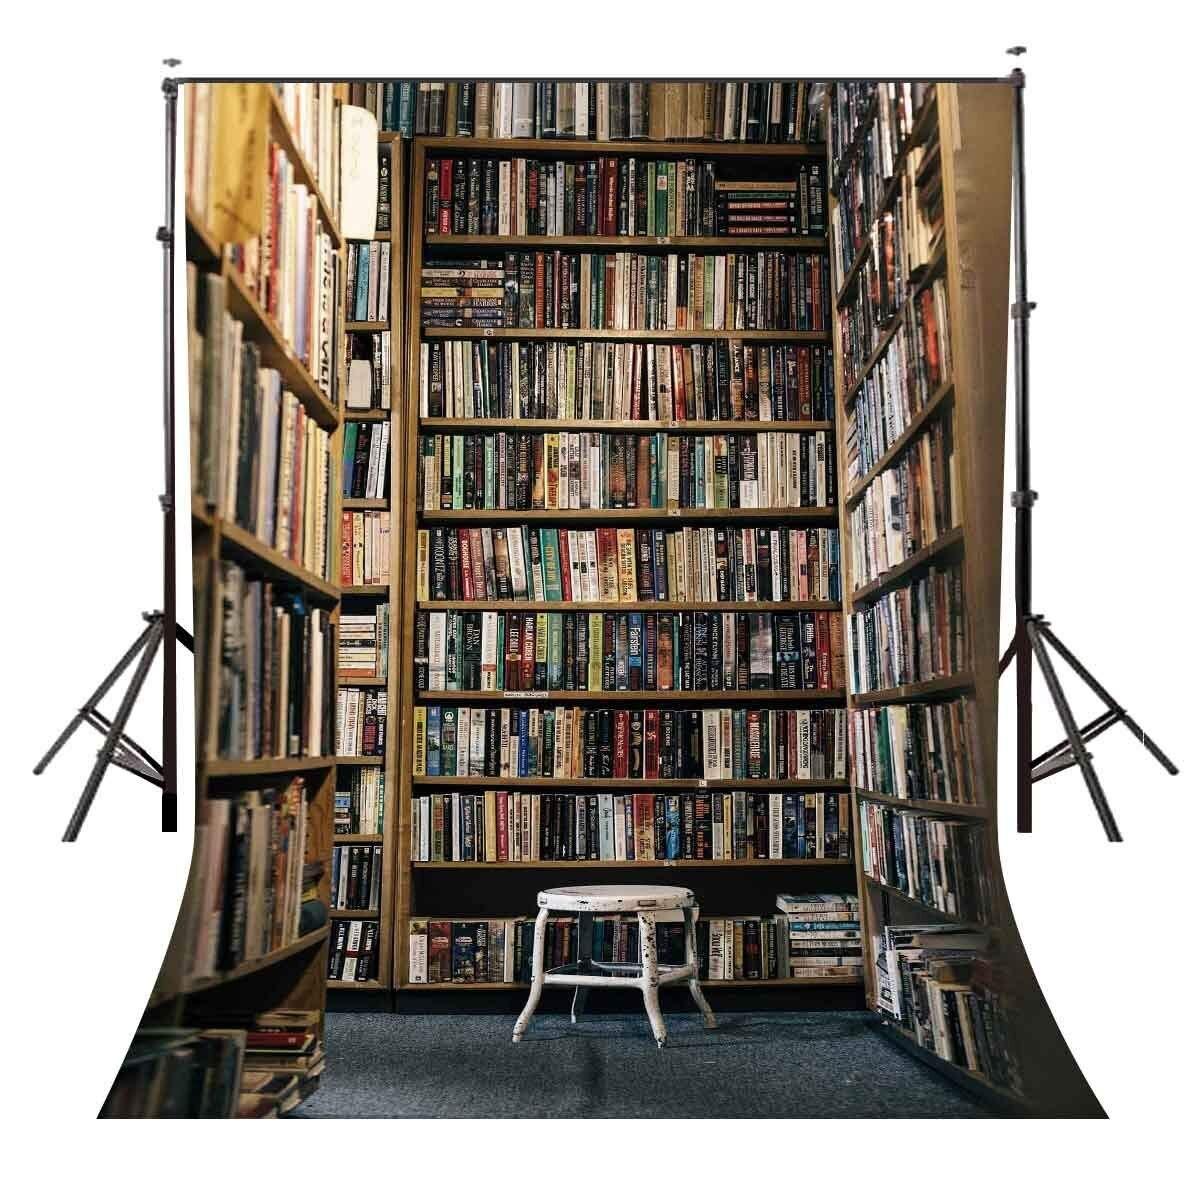 5x7ft Photography Backdrop Bookshelf Full of Books Backdrop Studio Props